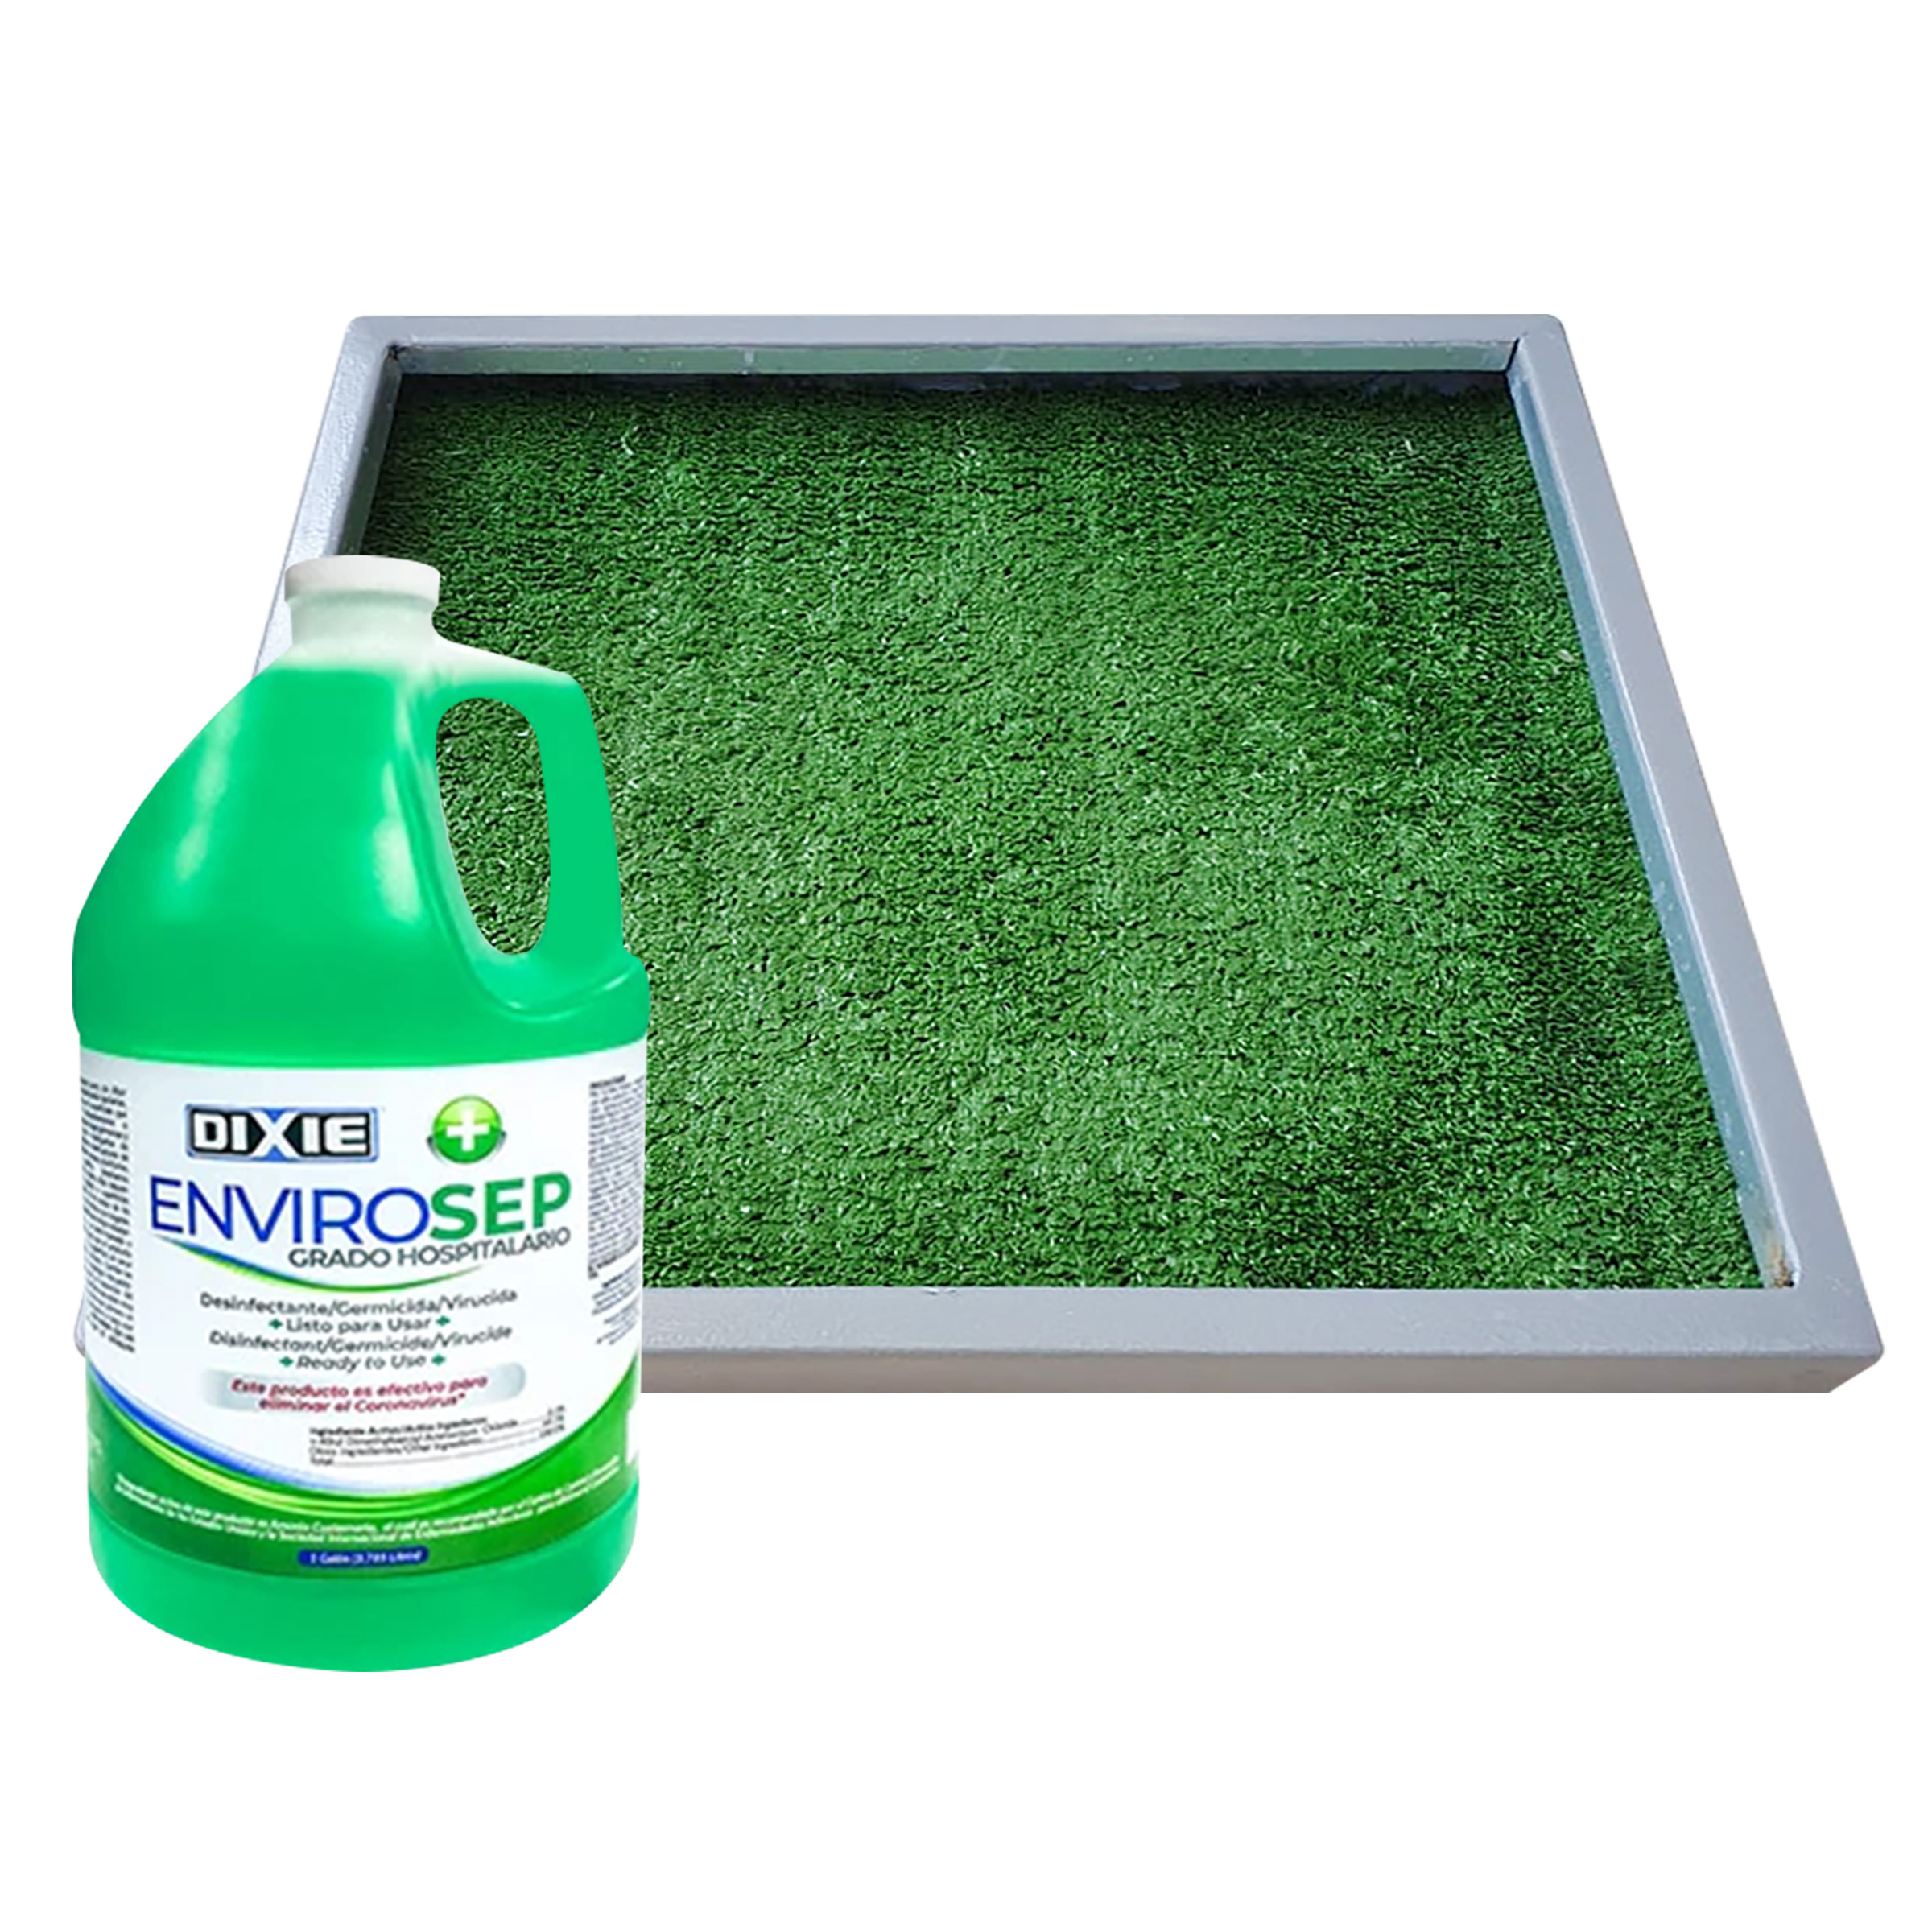 Kit de Bandeja 45x34 cm + 1GL de Desinfectante/Germicida/Virucida Envirosep